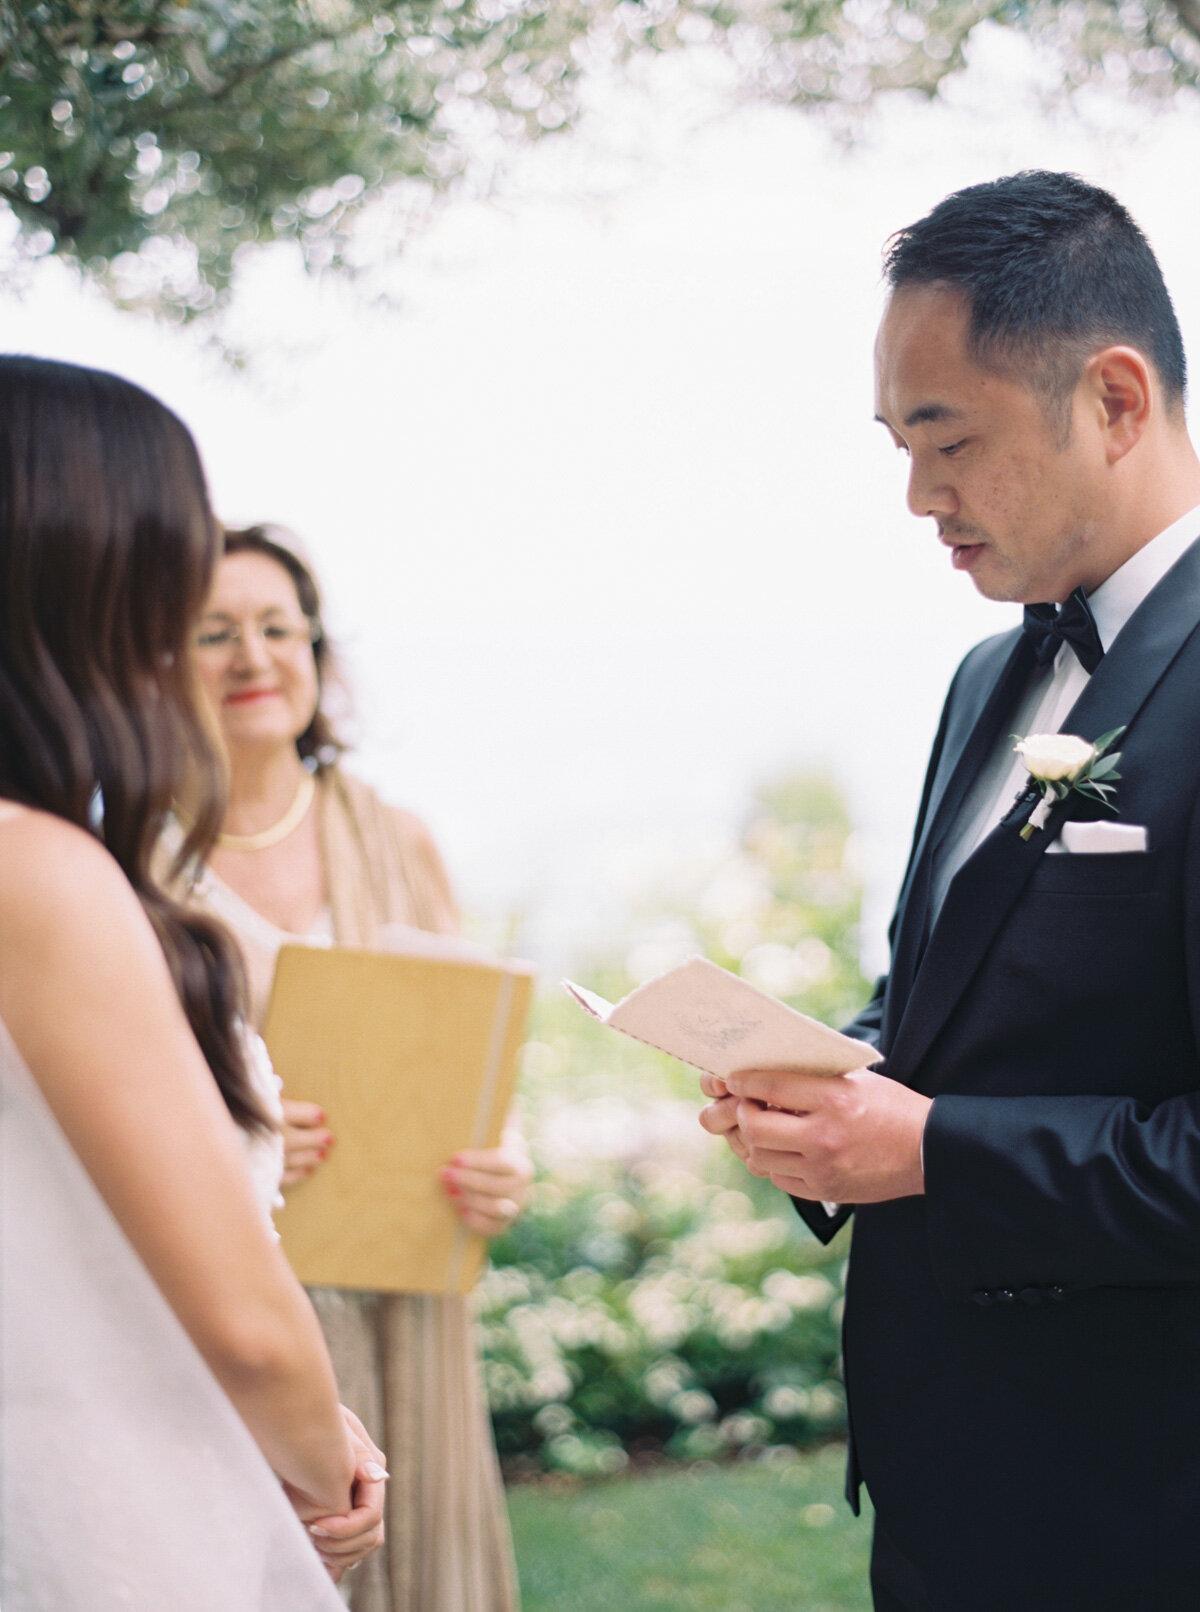 Belmond-Hotel-Caruso-ravello-elopement-Katie-Grant-destination-wedding (25 of 50).jpg